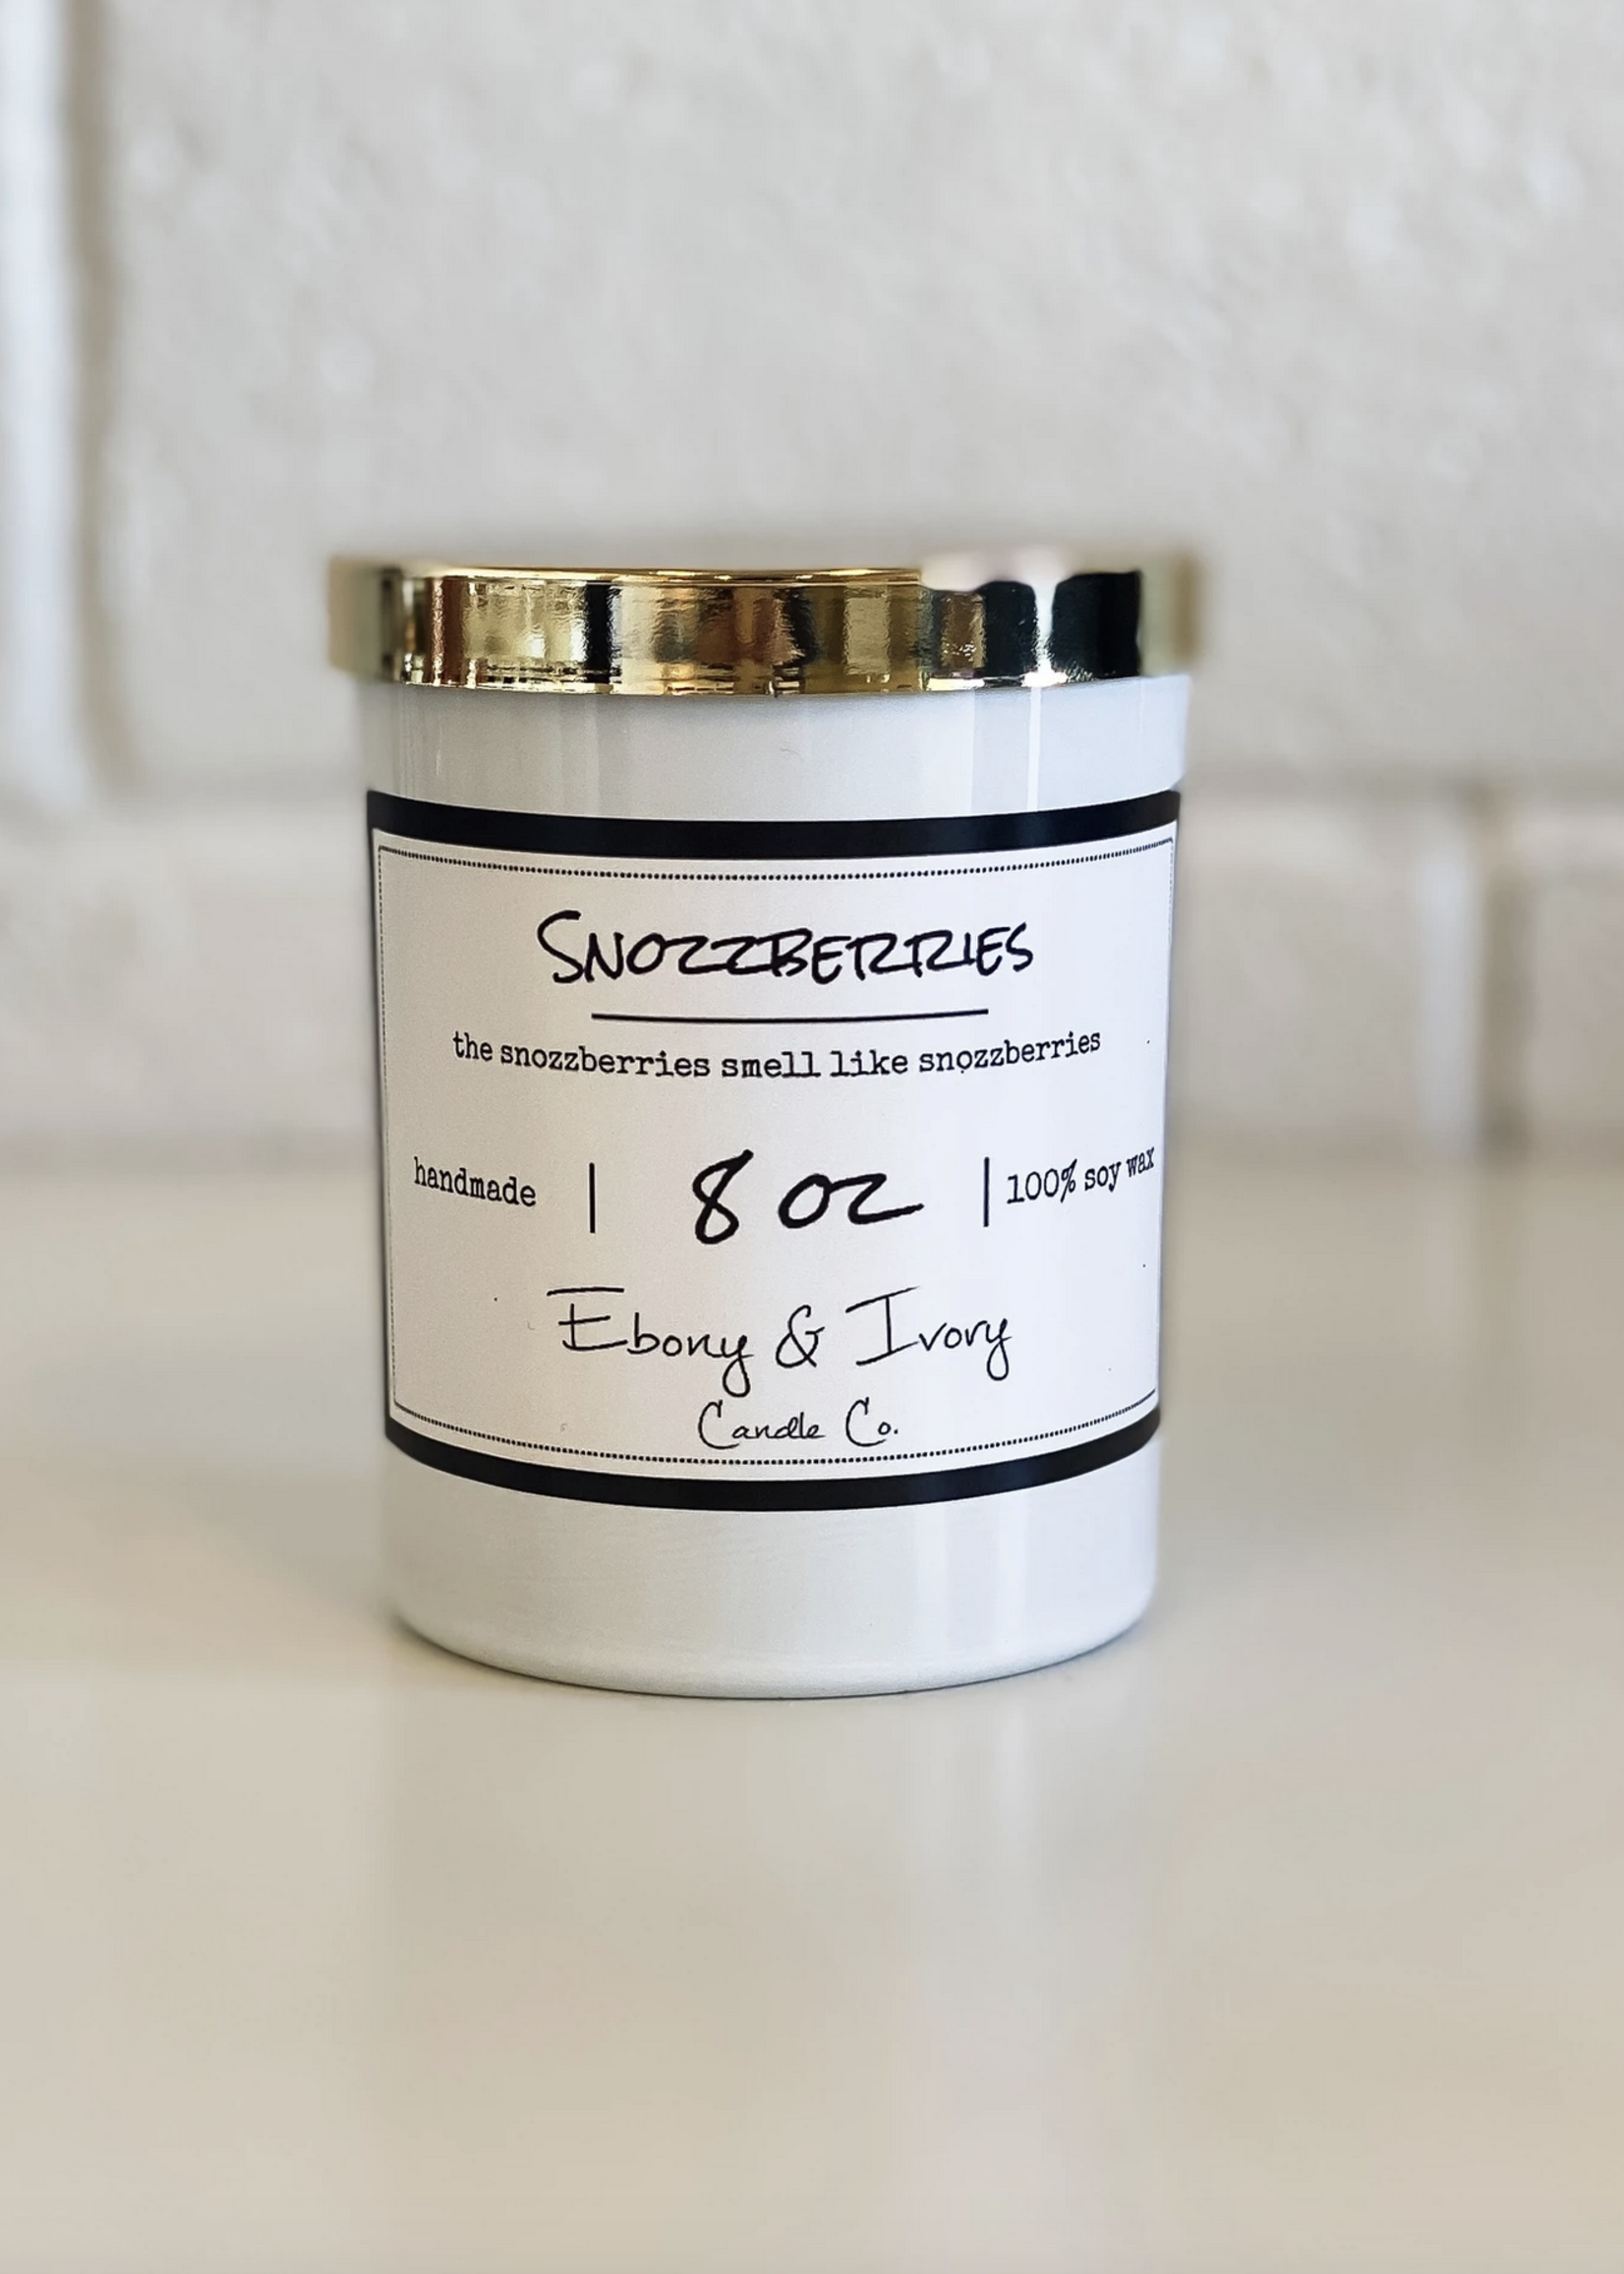 Ebony & Ivory Candle Co. Snozzberries 8oz